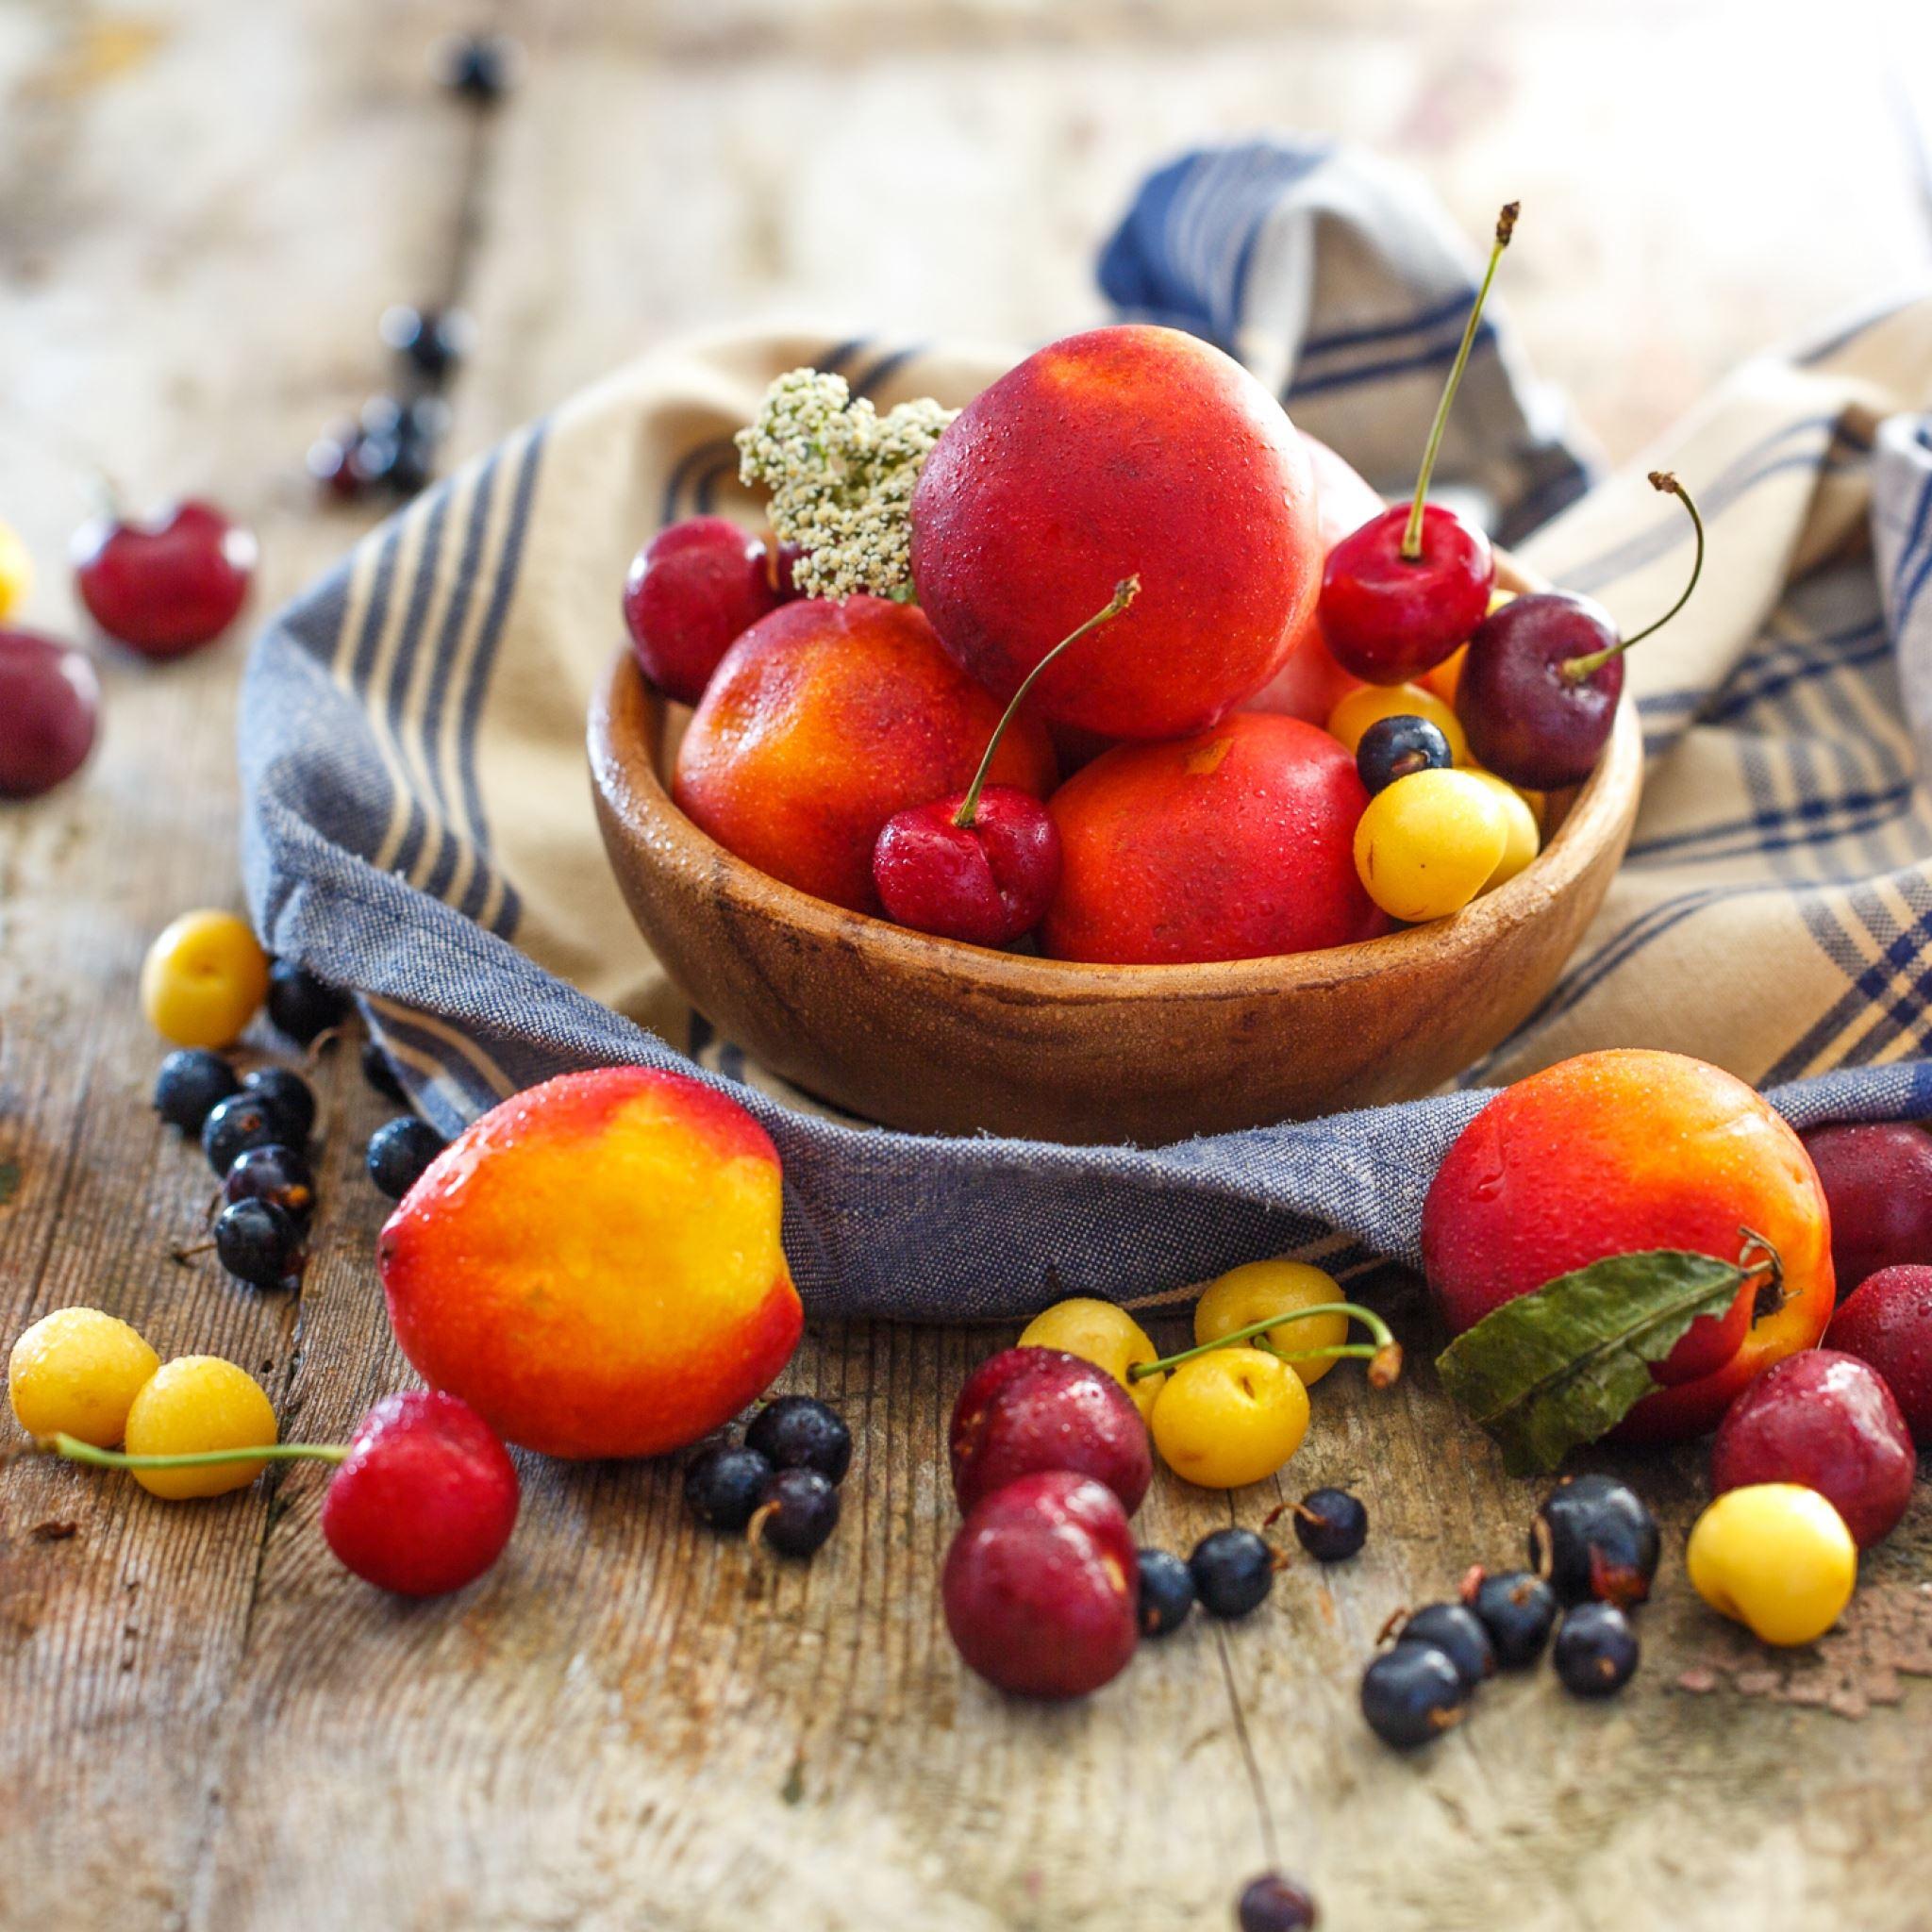 Fruits iPad Air wallpaper